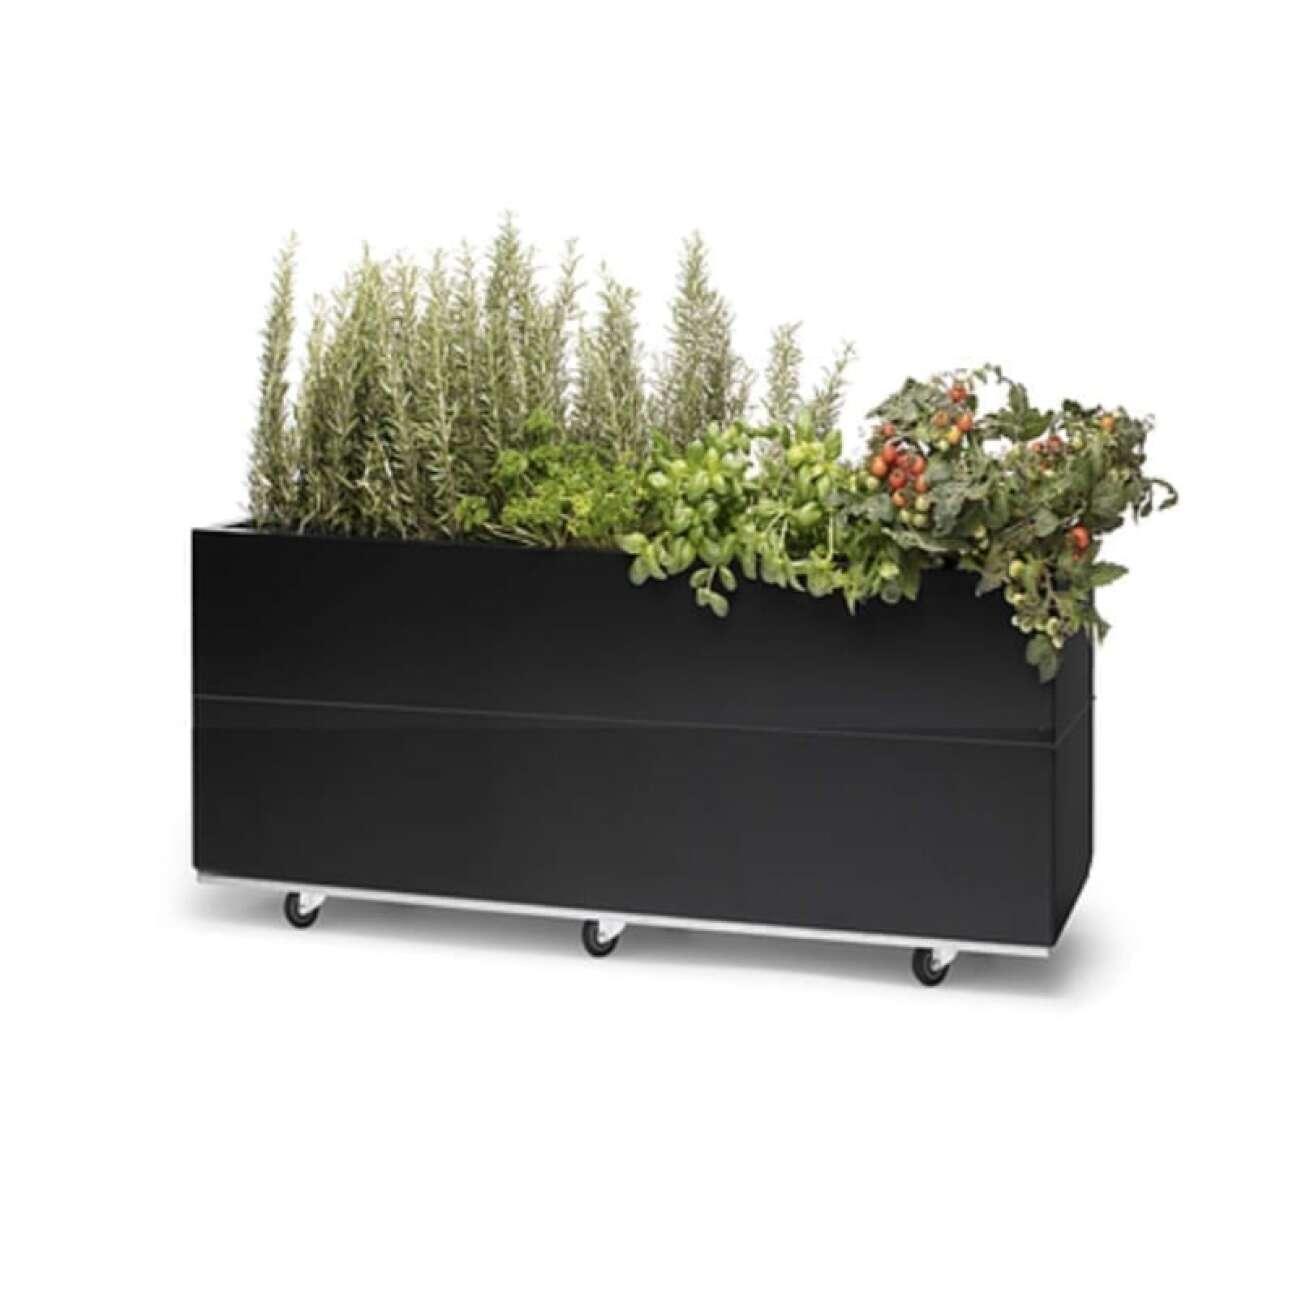 Plantekasse I Sort/galfan H50 Med Bunn Og Hjul/ben Hagemøbler og utemøbler - Fine design